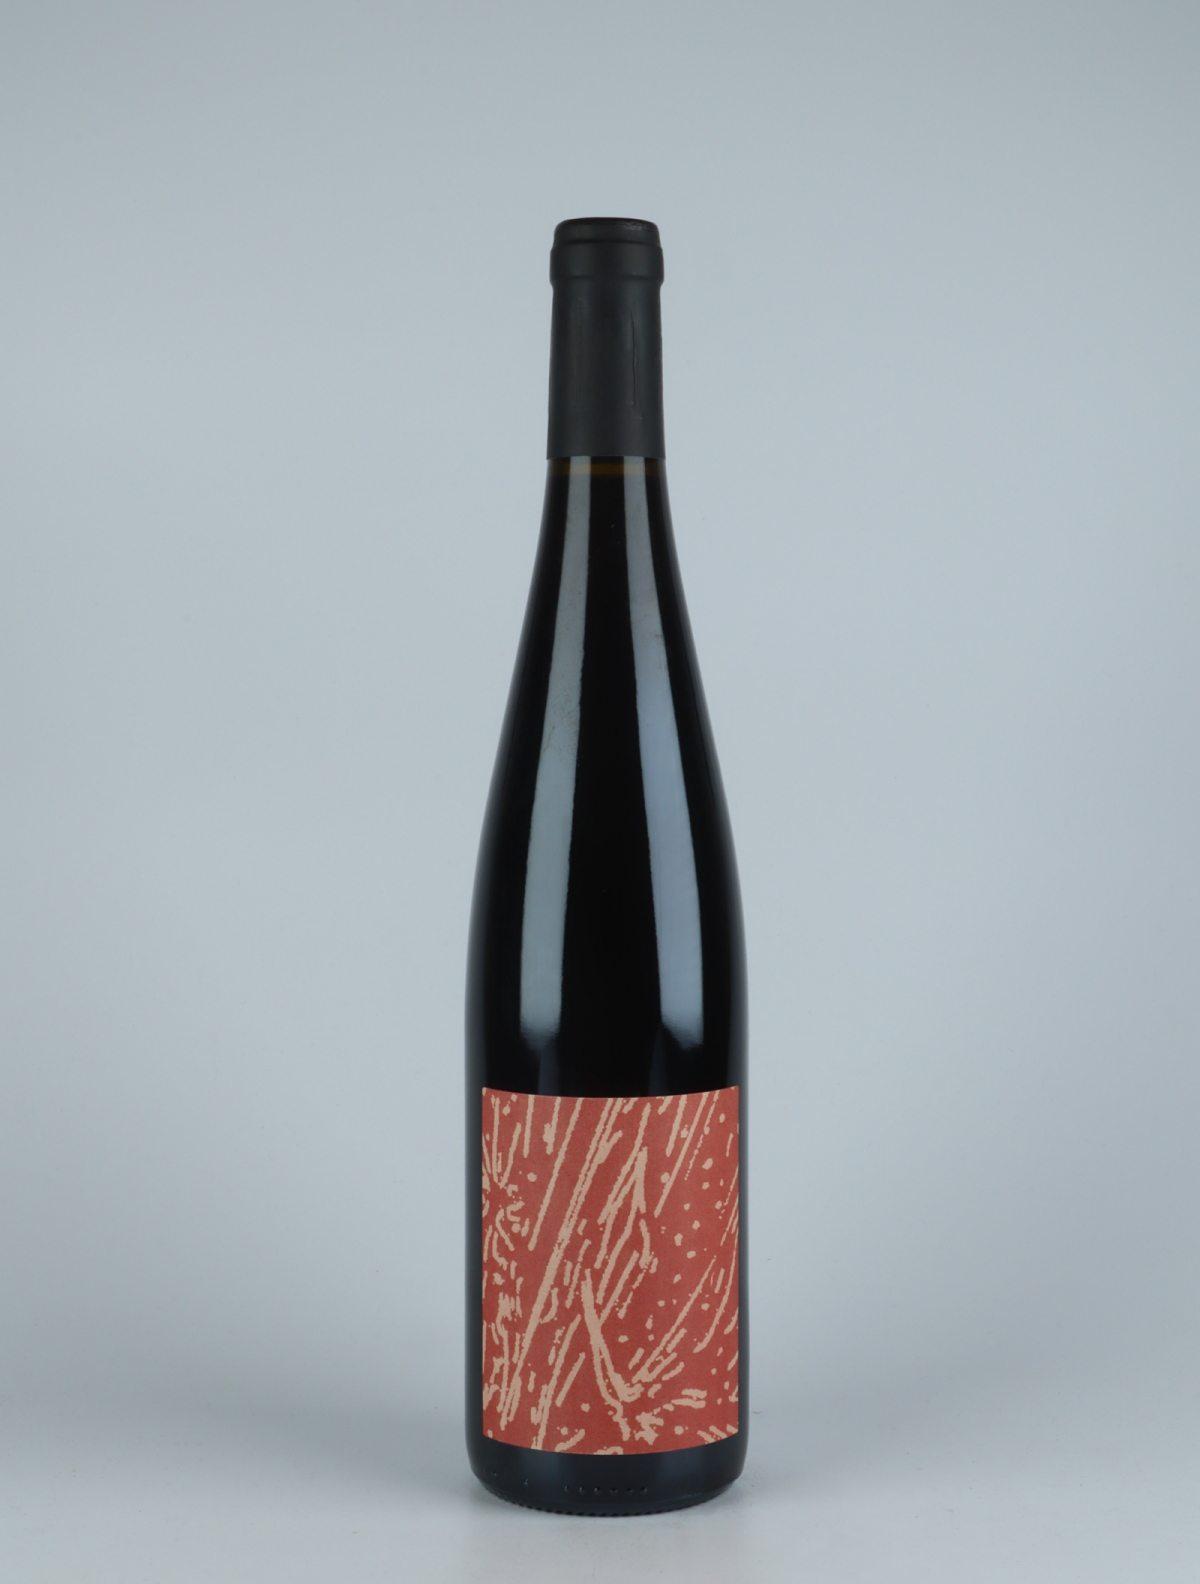 Le Farouche - Pinot Noir